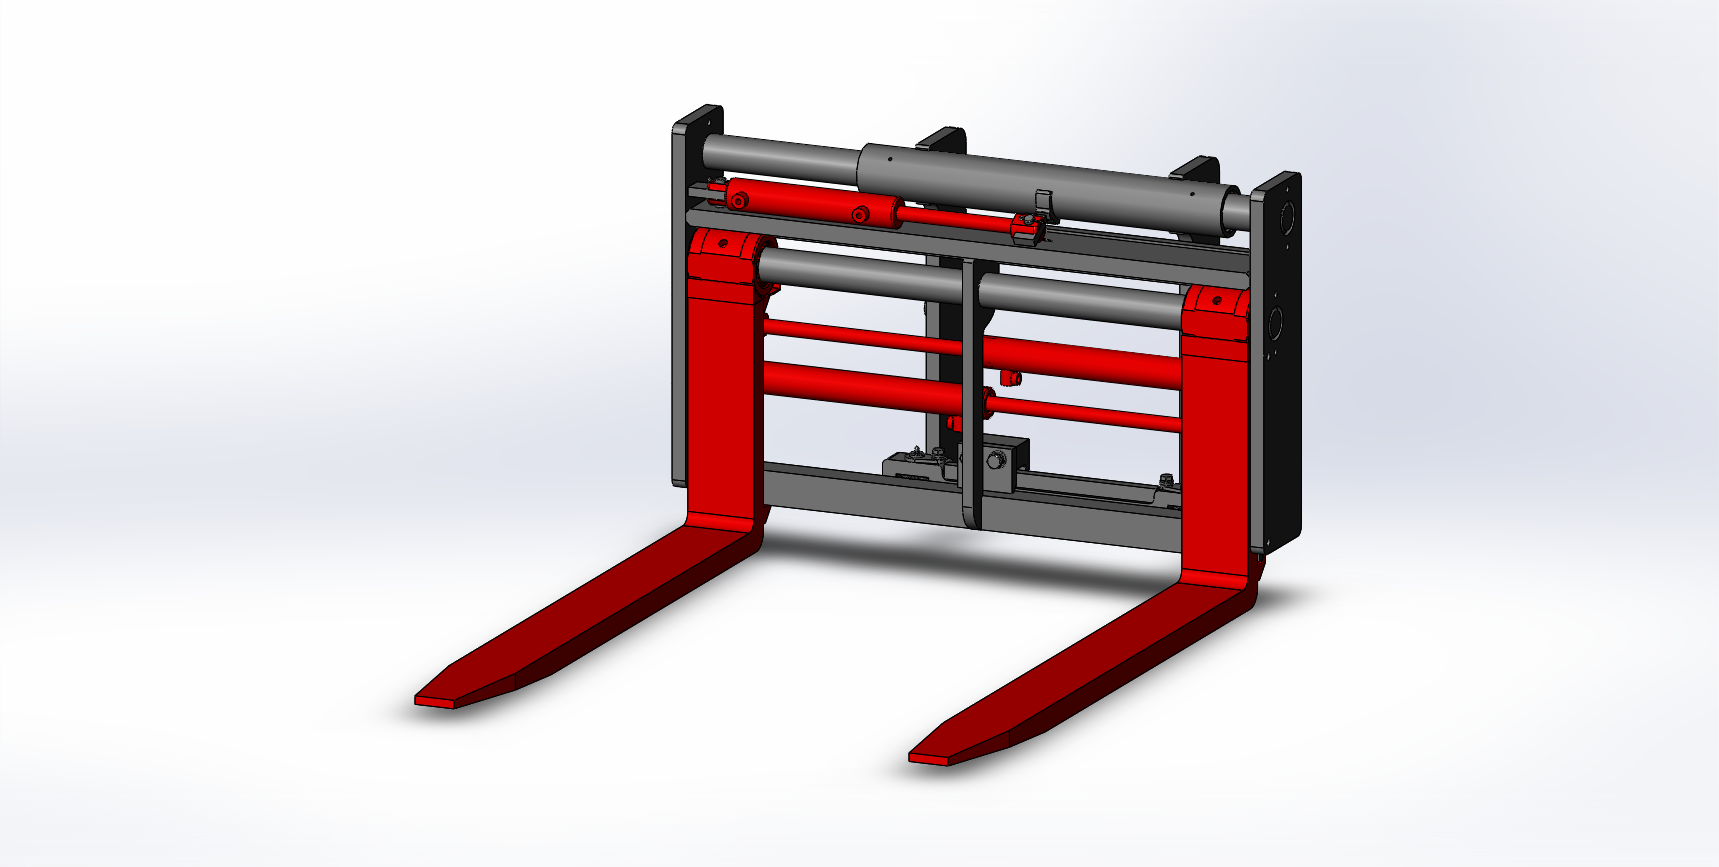 Heavy Duty Side shifter & Fork Positioners - Medium Duty